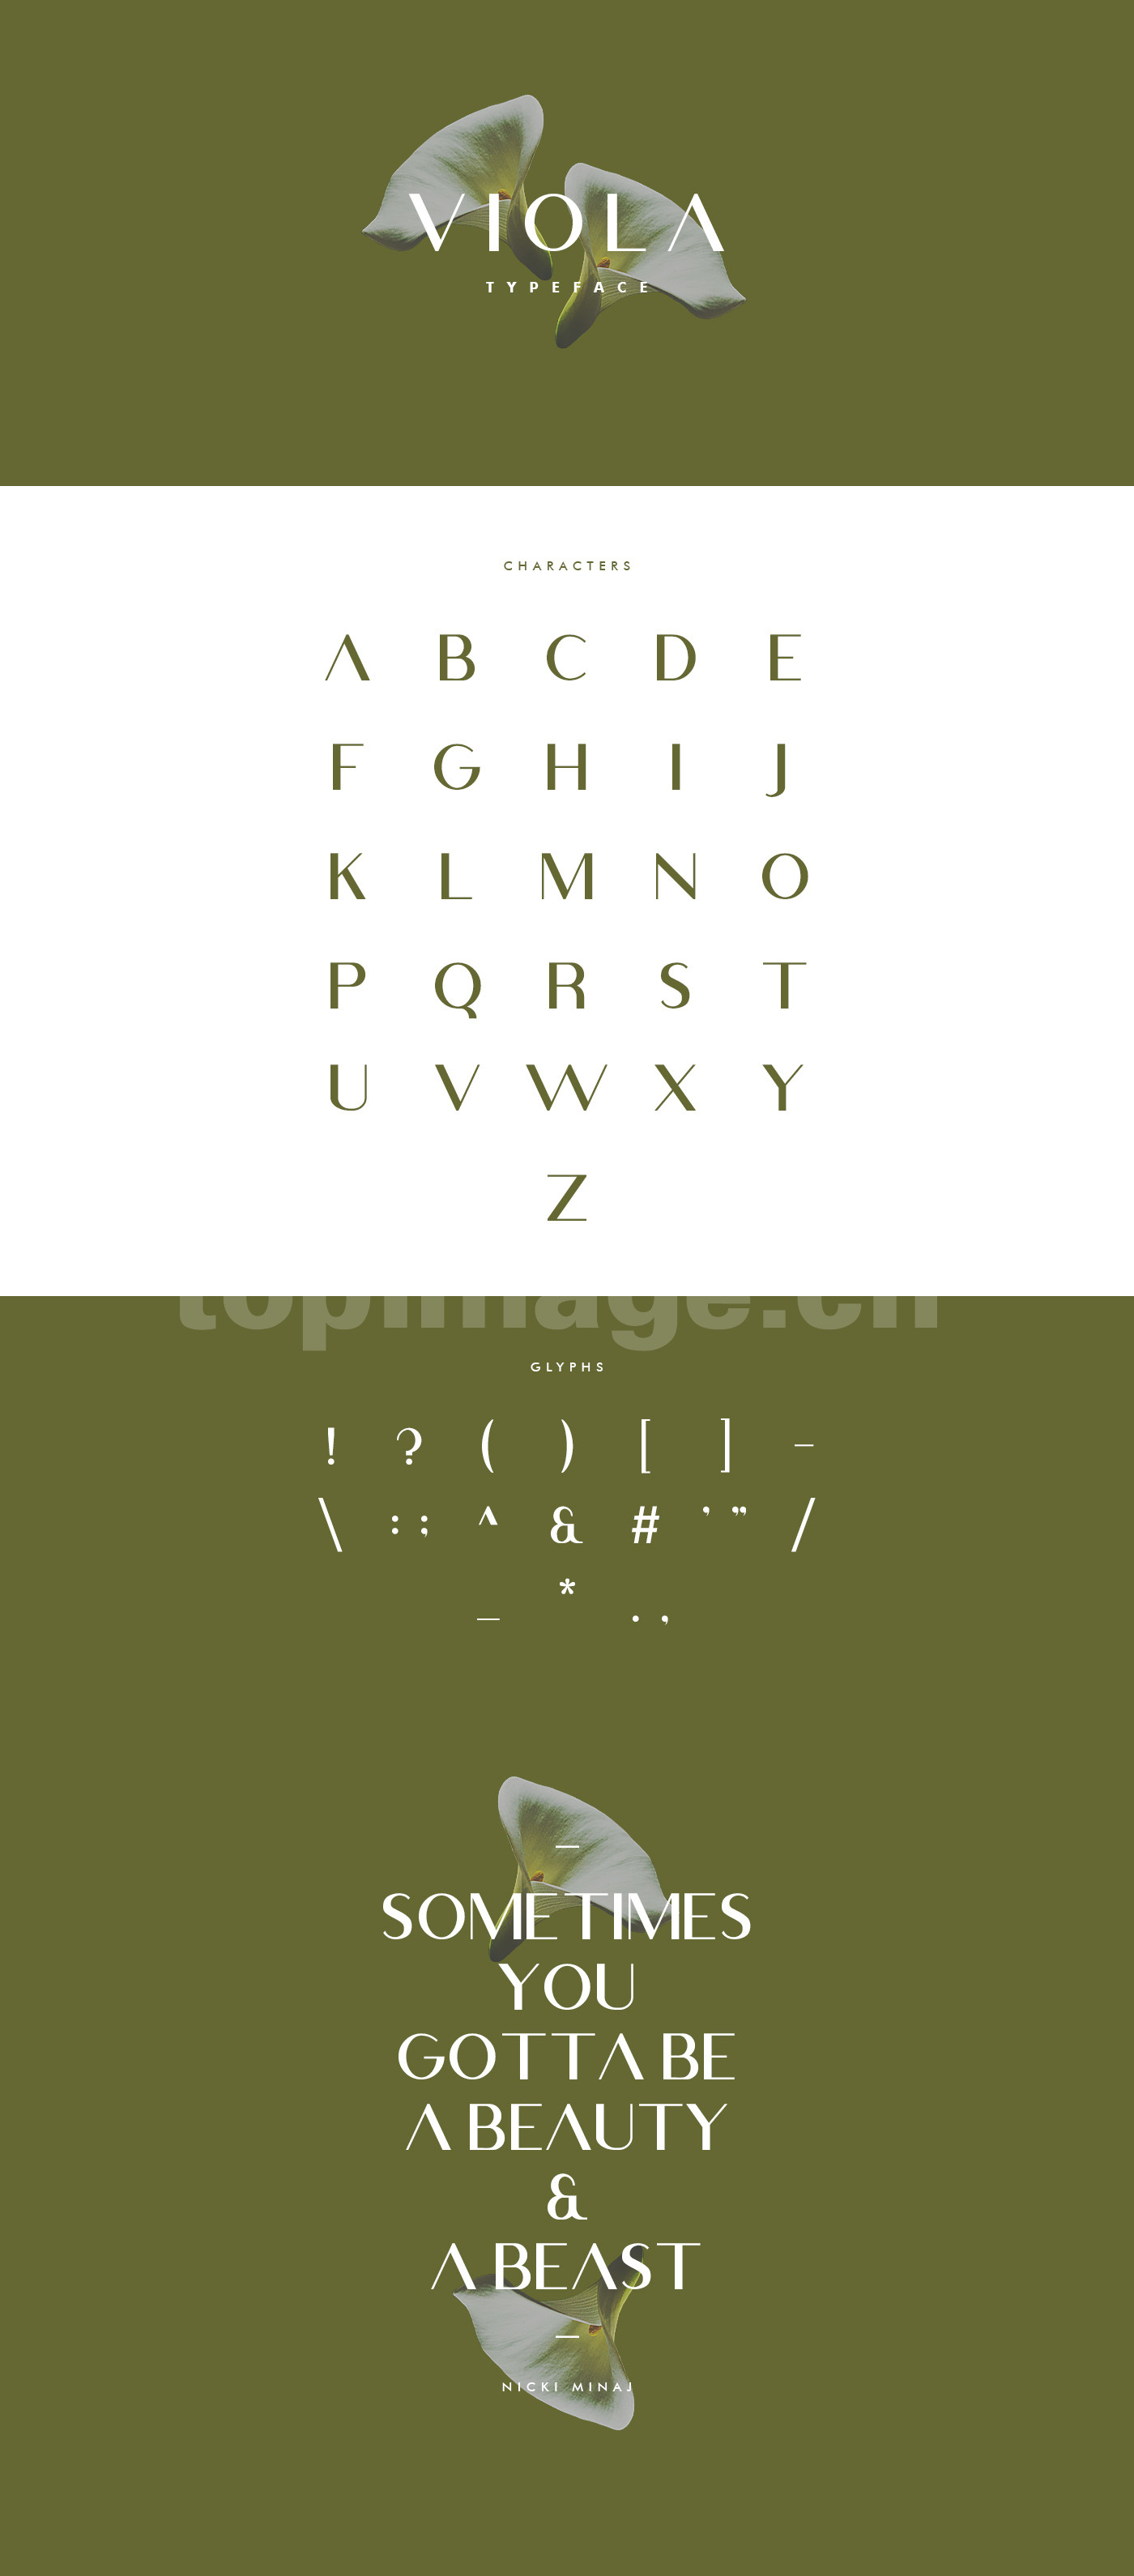 Viola时尚纤细简约海报英文字体适合logo下载